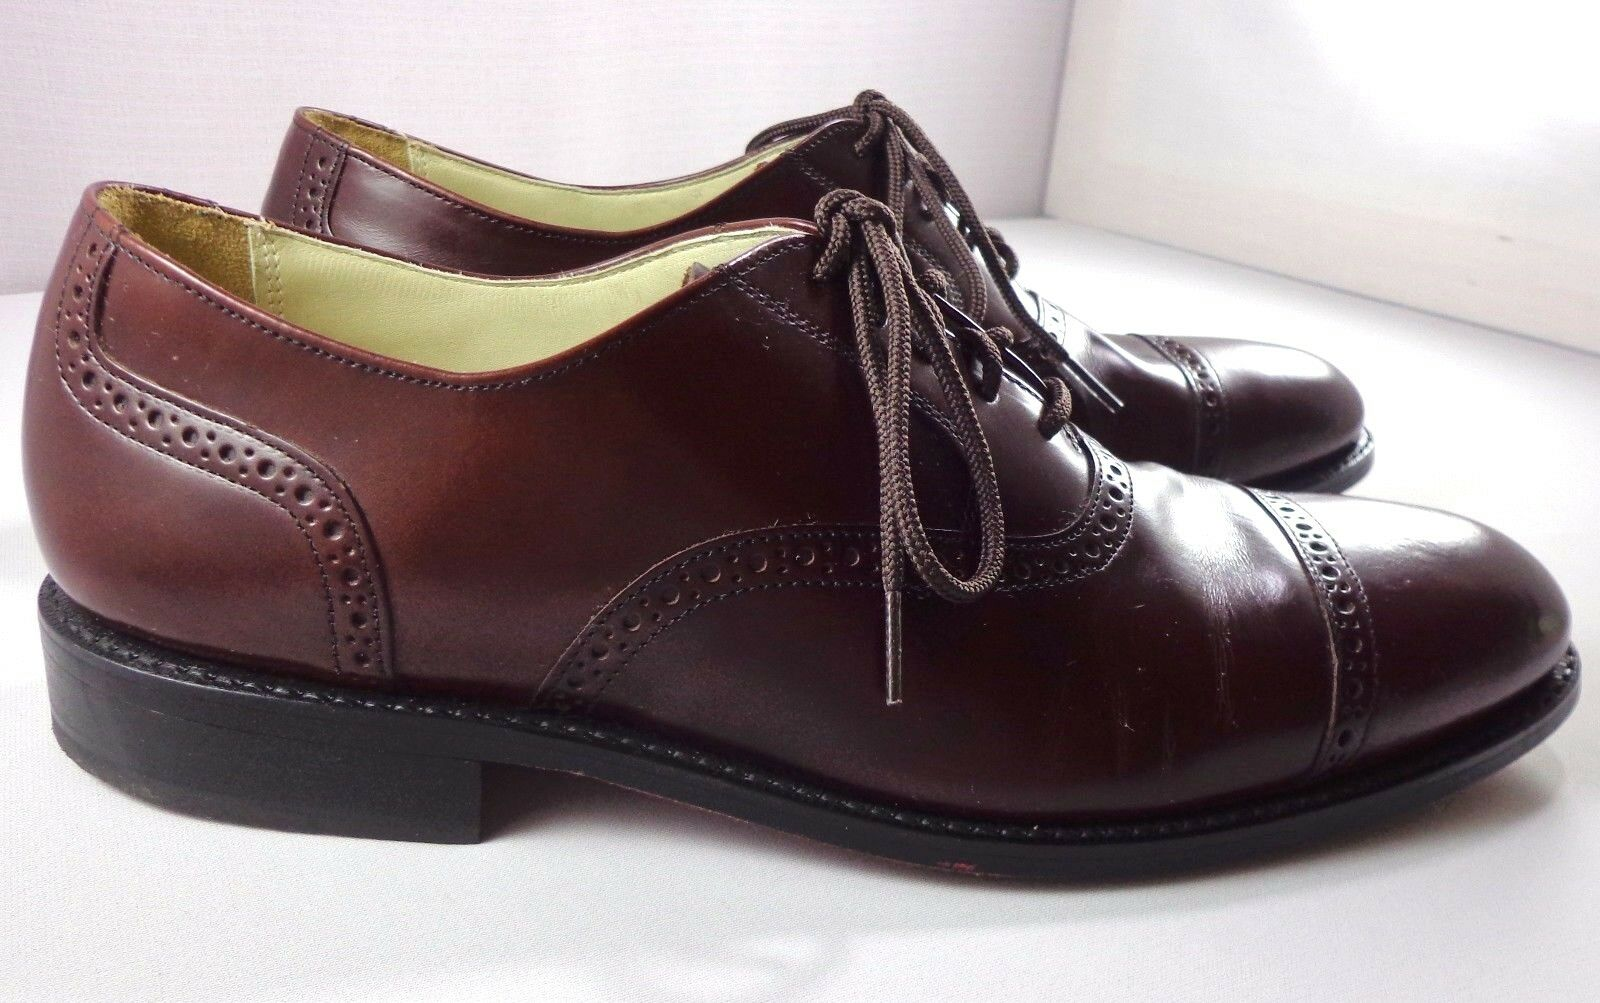 Para Hombre de Cuero Marrón Borgoña Bostonian Oxfords Cap Toe Zapatos D